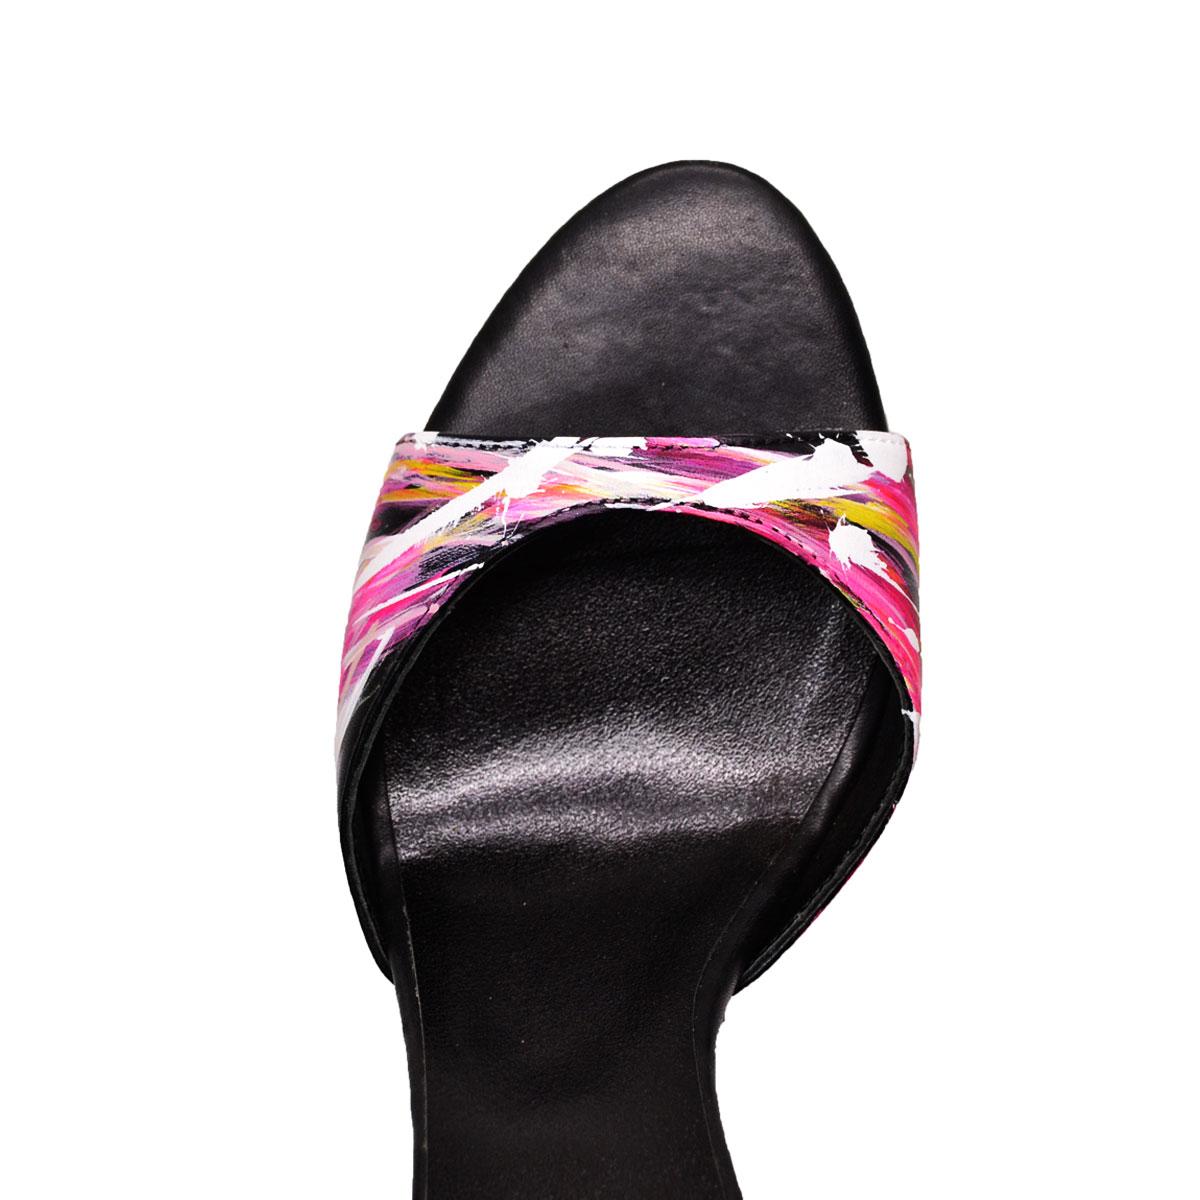 Janiko Damen High Heels RUBY Mehrfarbig R1025